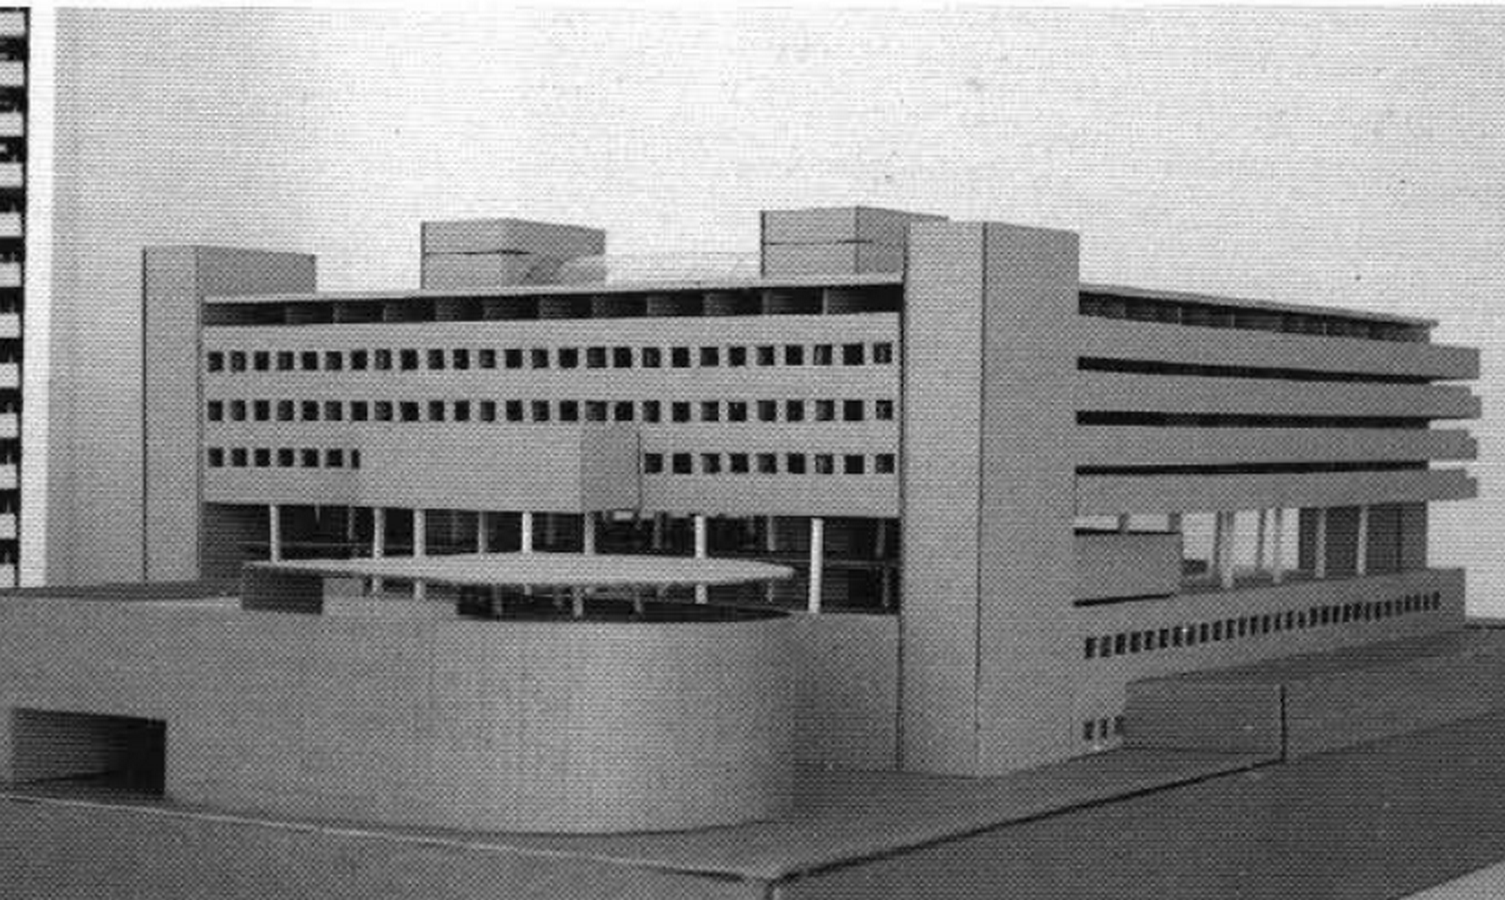 Hospital in Montreux - Sheet2